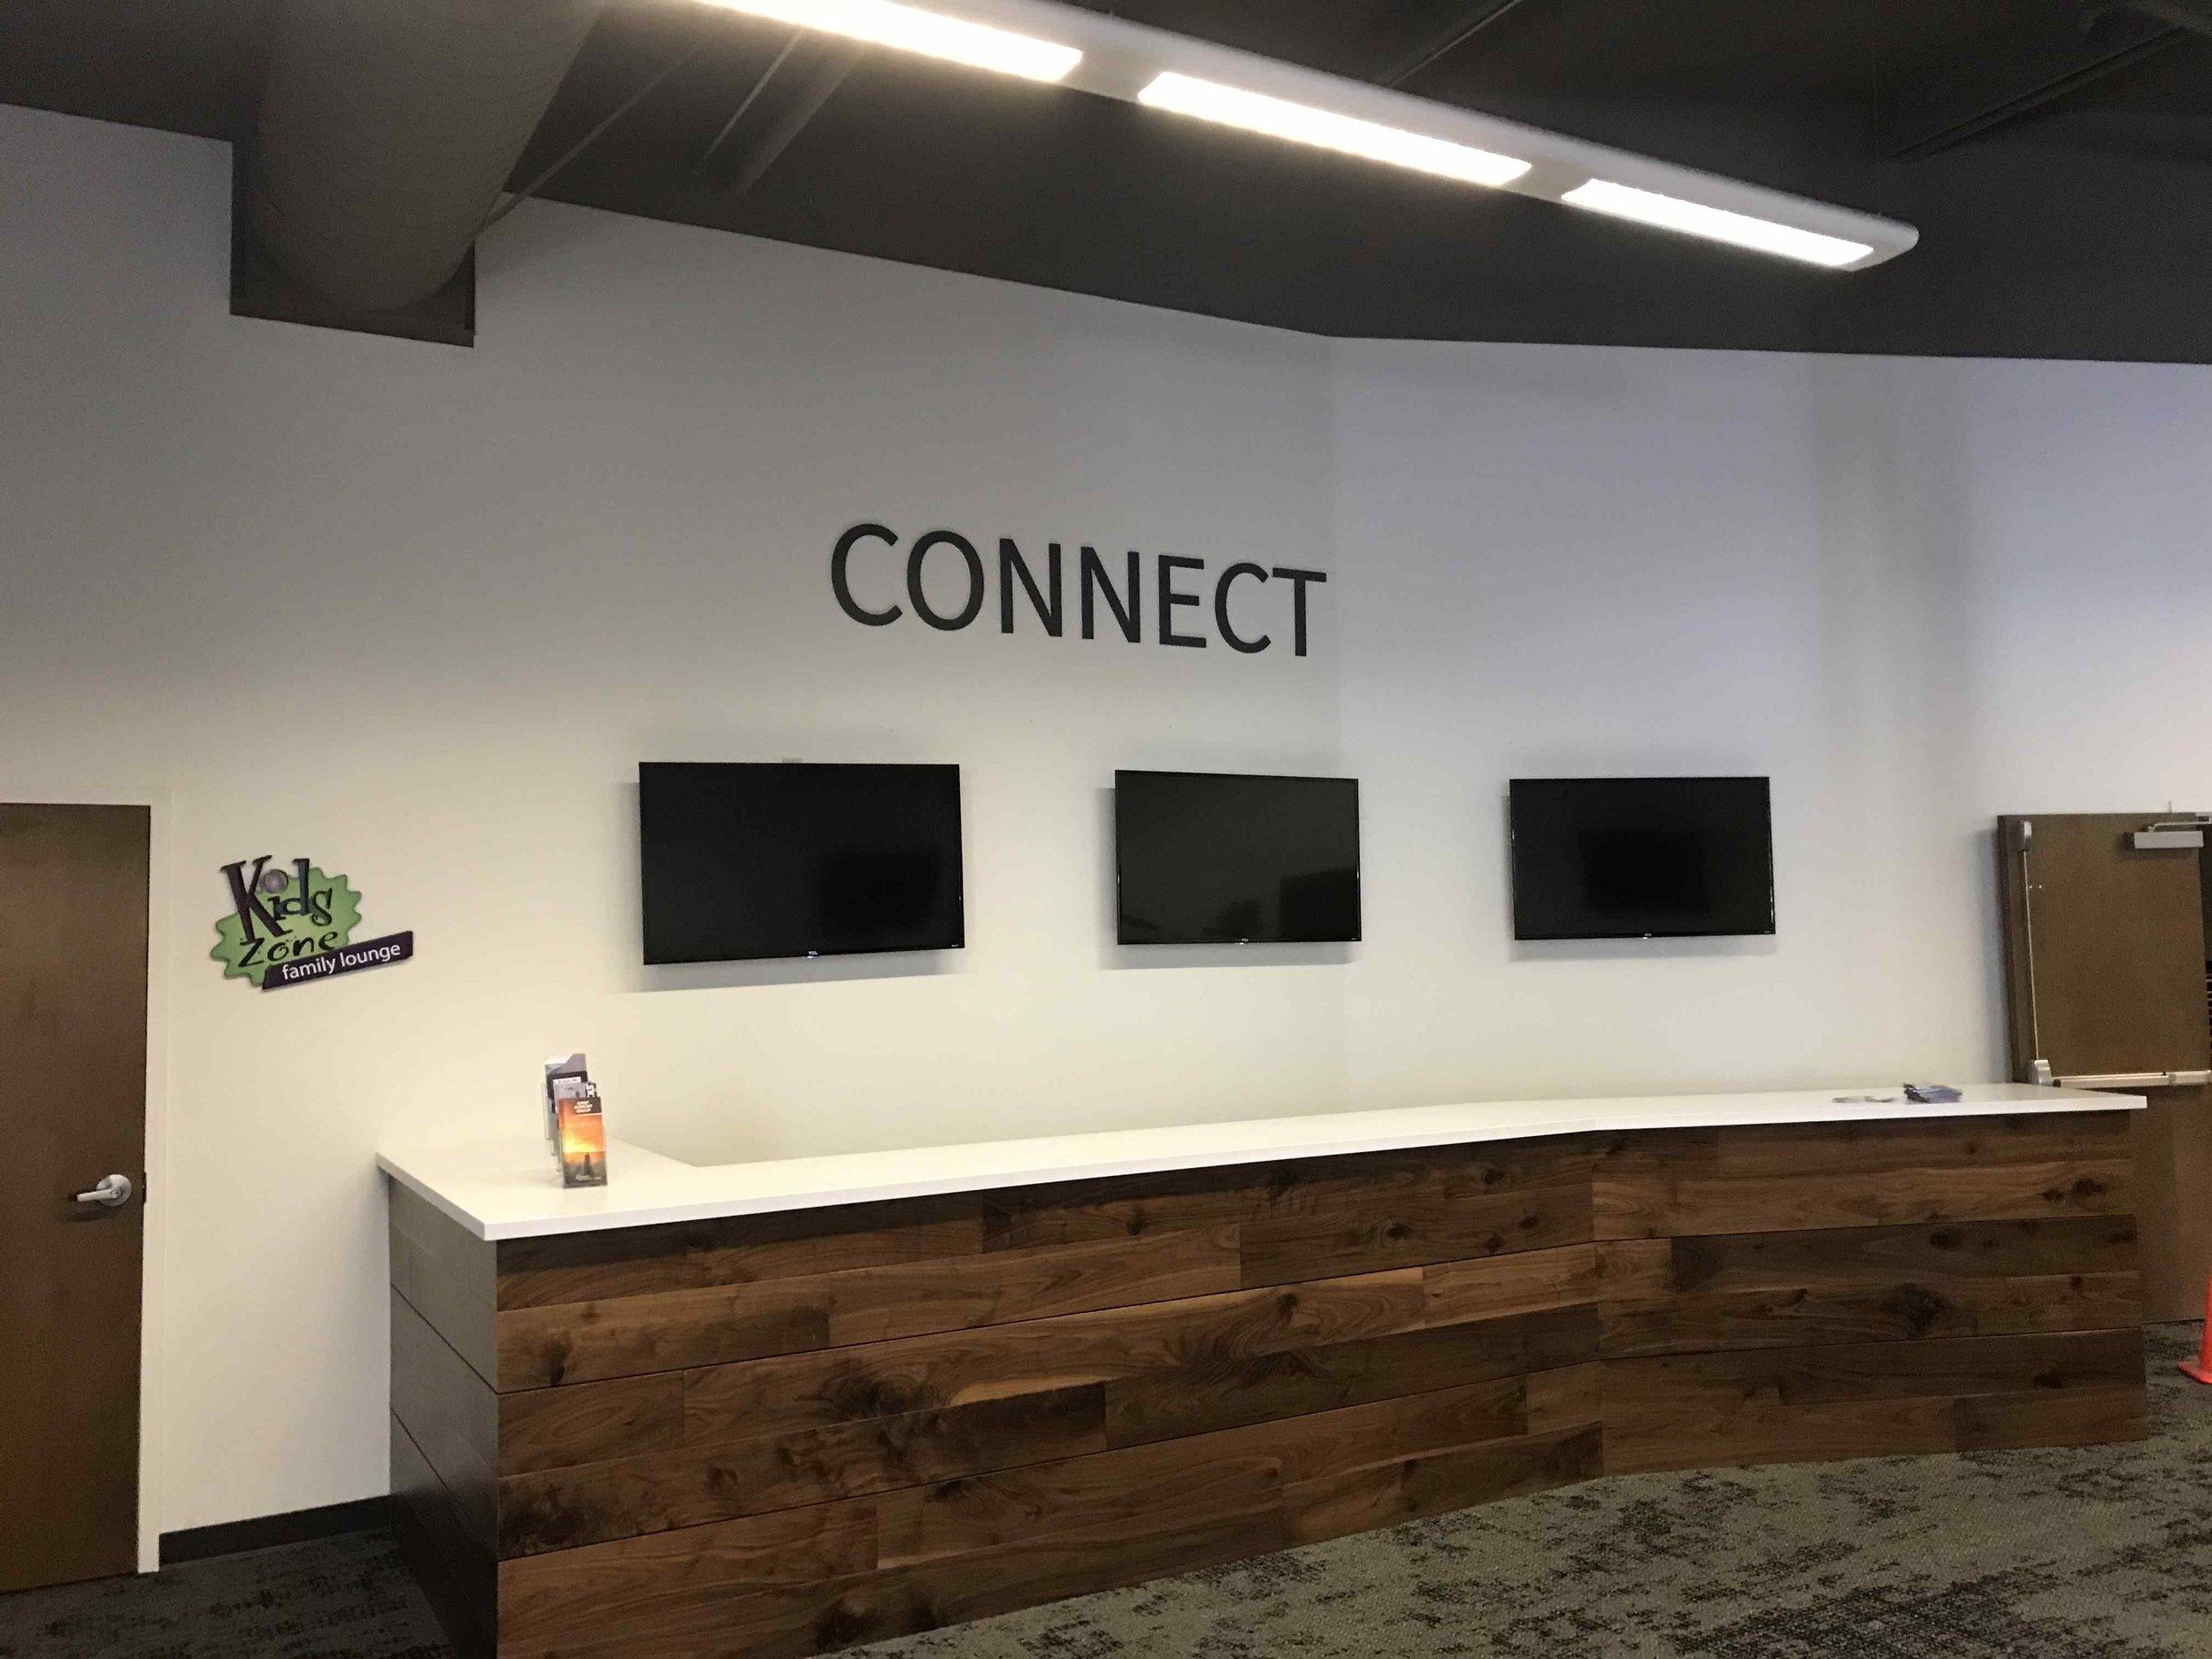 Acrylic-Dimensional-Connect-Sign.jpg